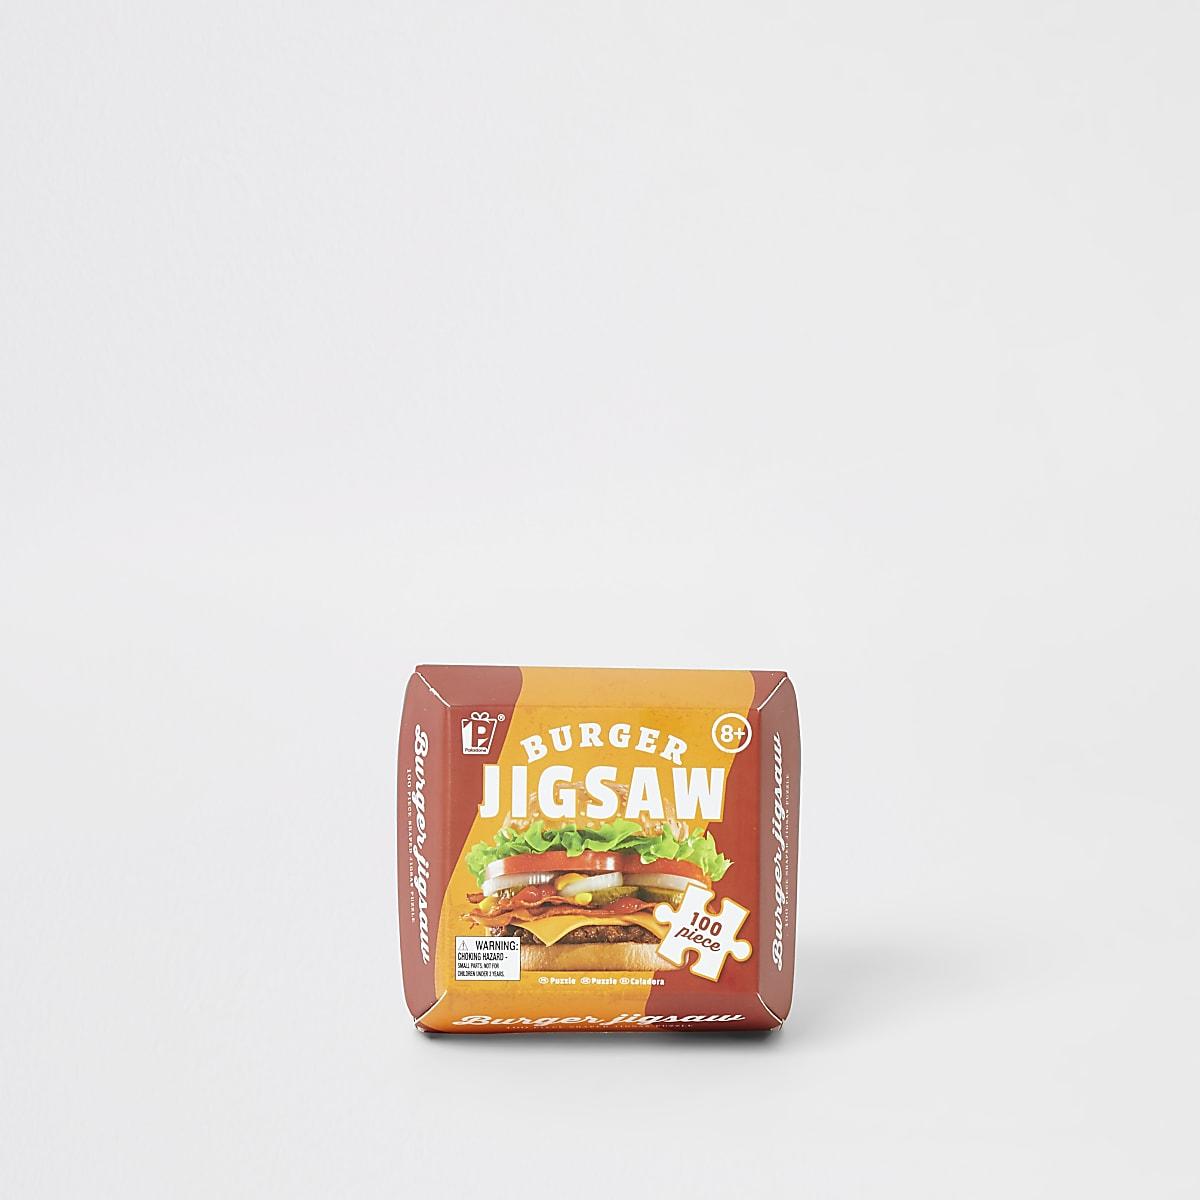 Burger 100 piece jigsaw puzzle